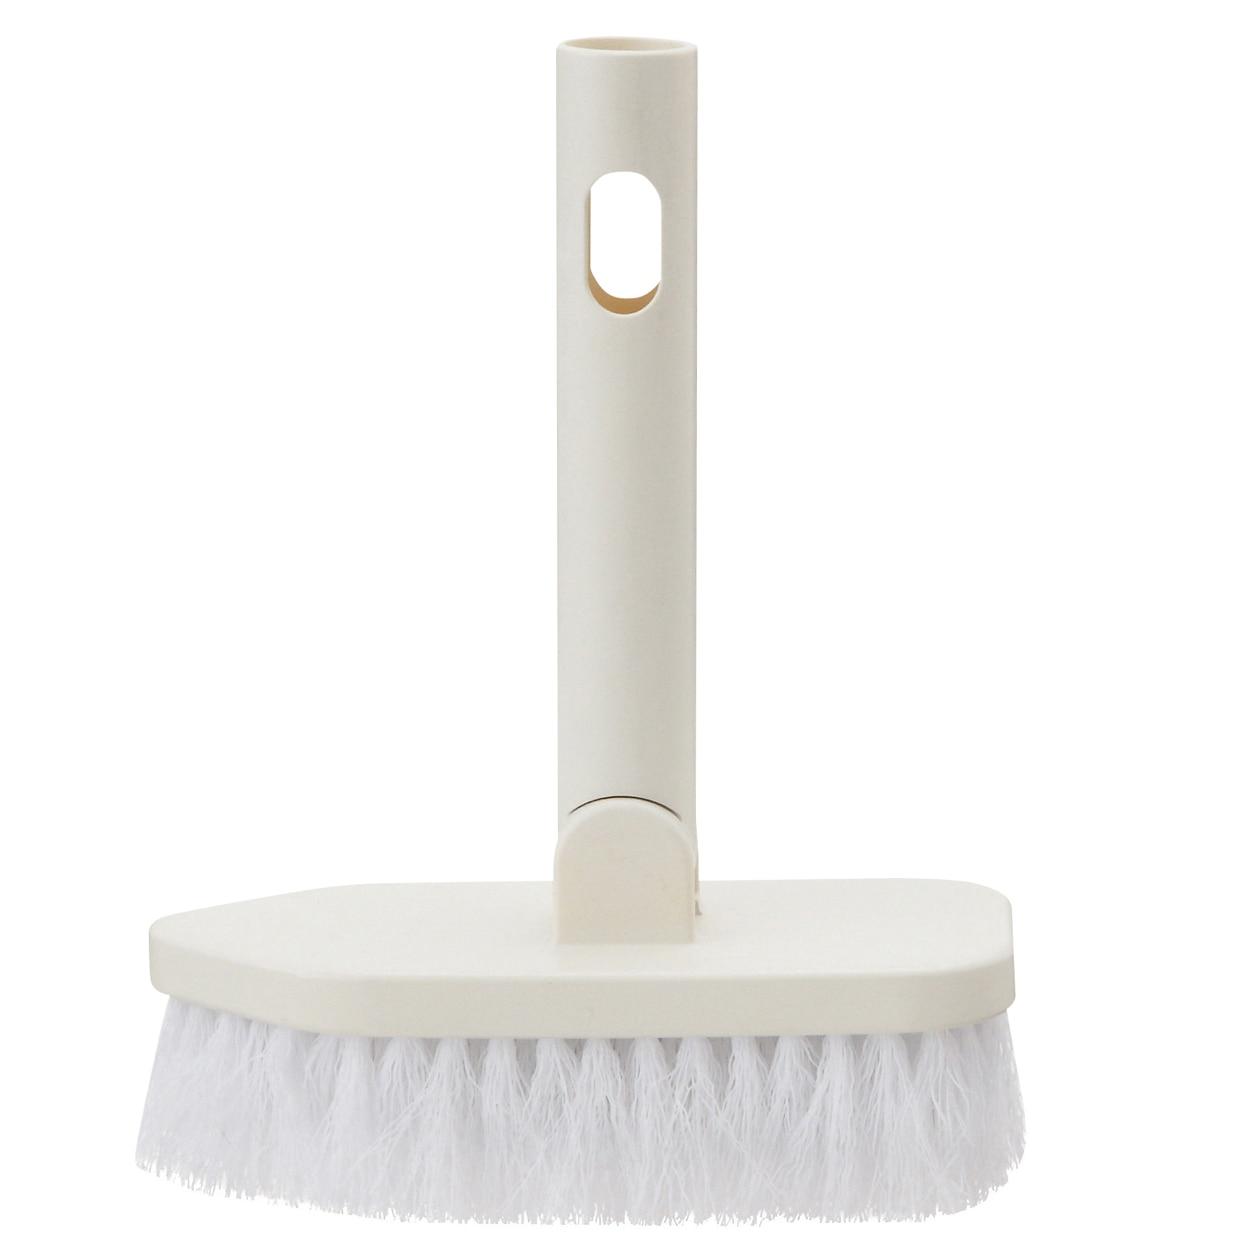 RoomClip商品情報 - 掃除用品システム・ブラシ